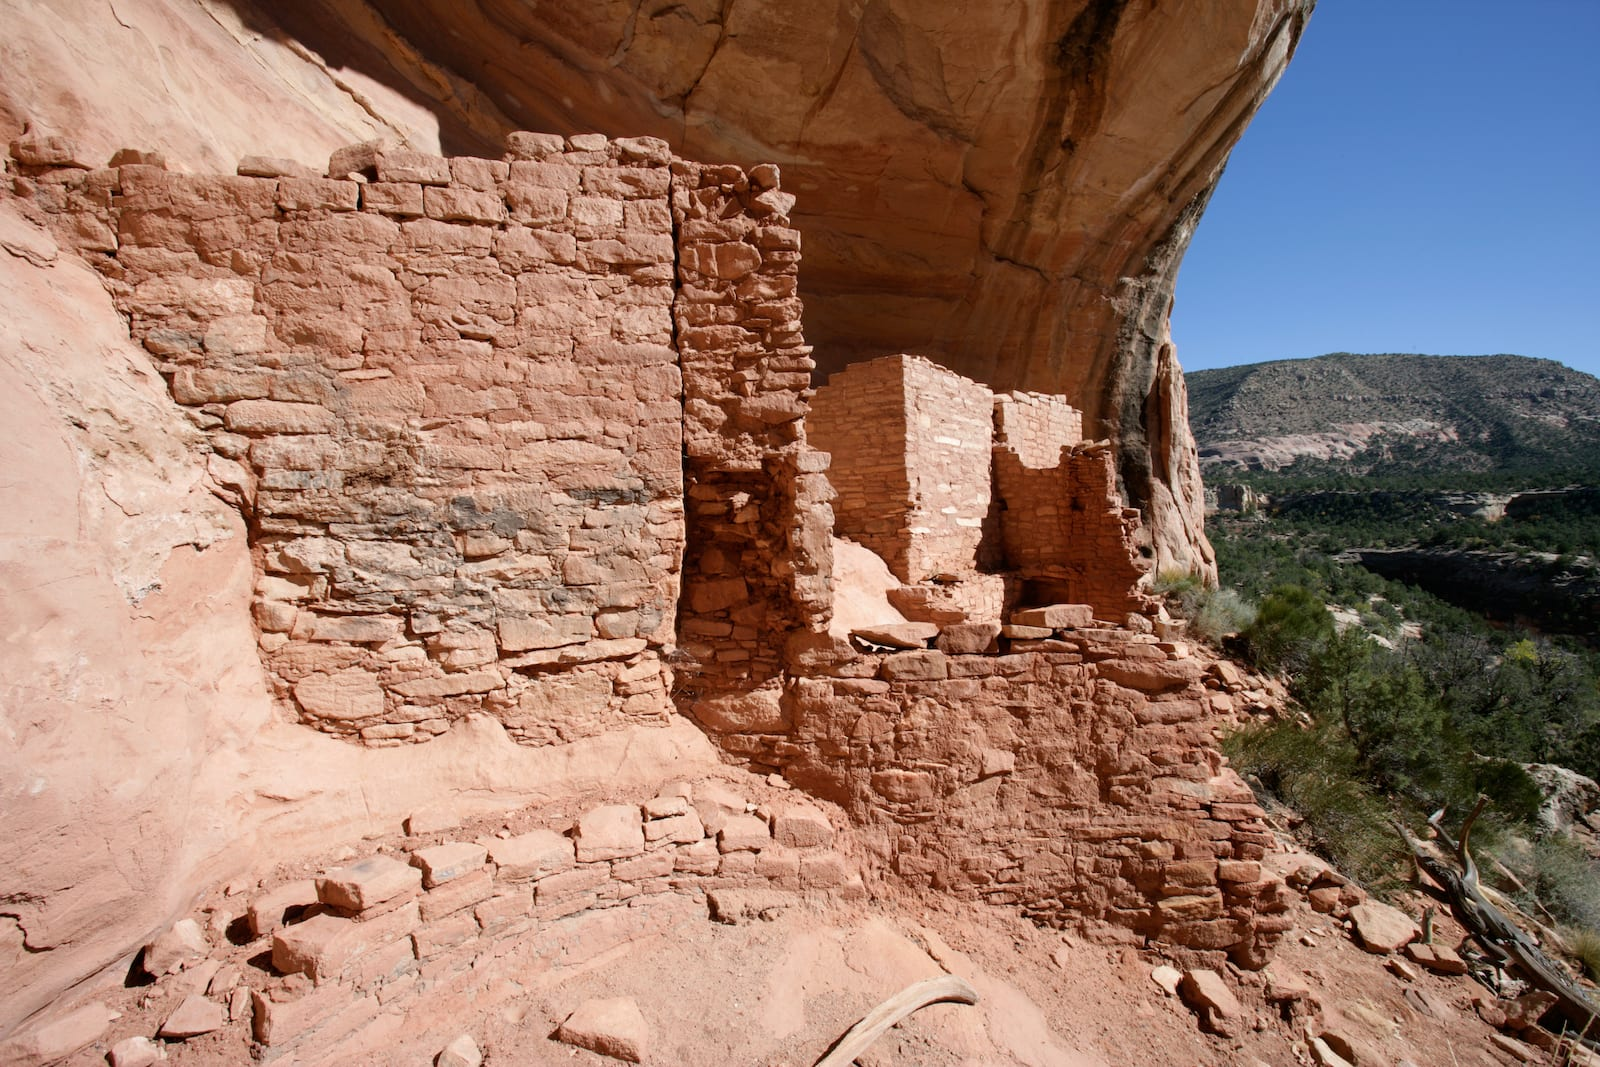 Ancient Puebloan Ruins at Canyons of the Ancients National Monument Colorado